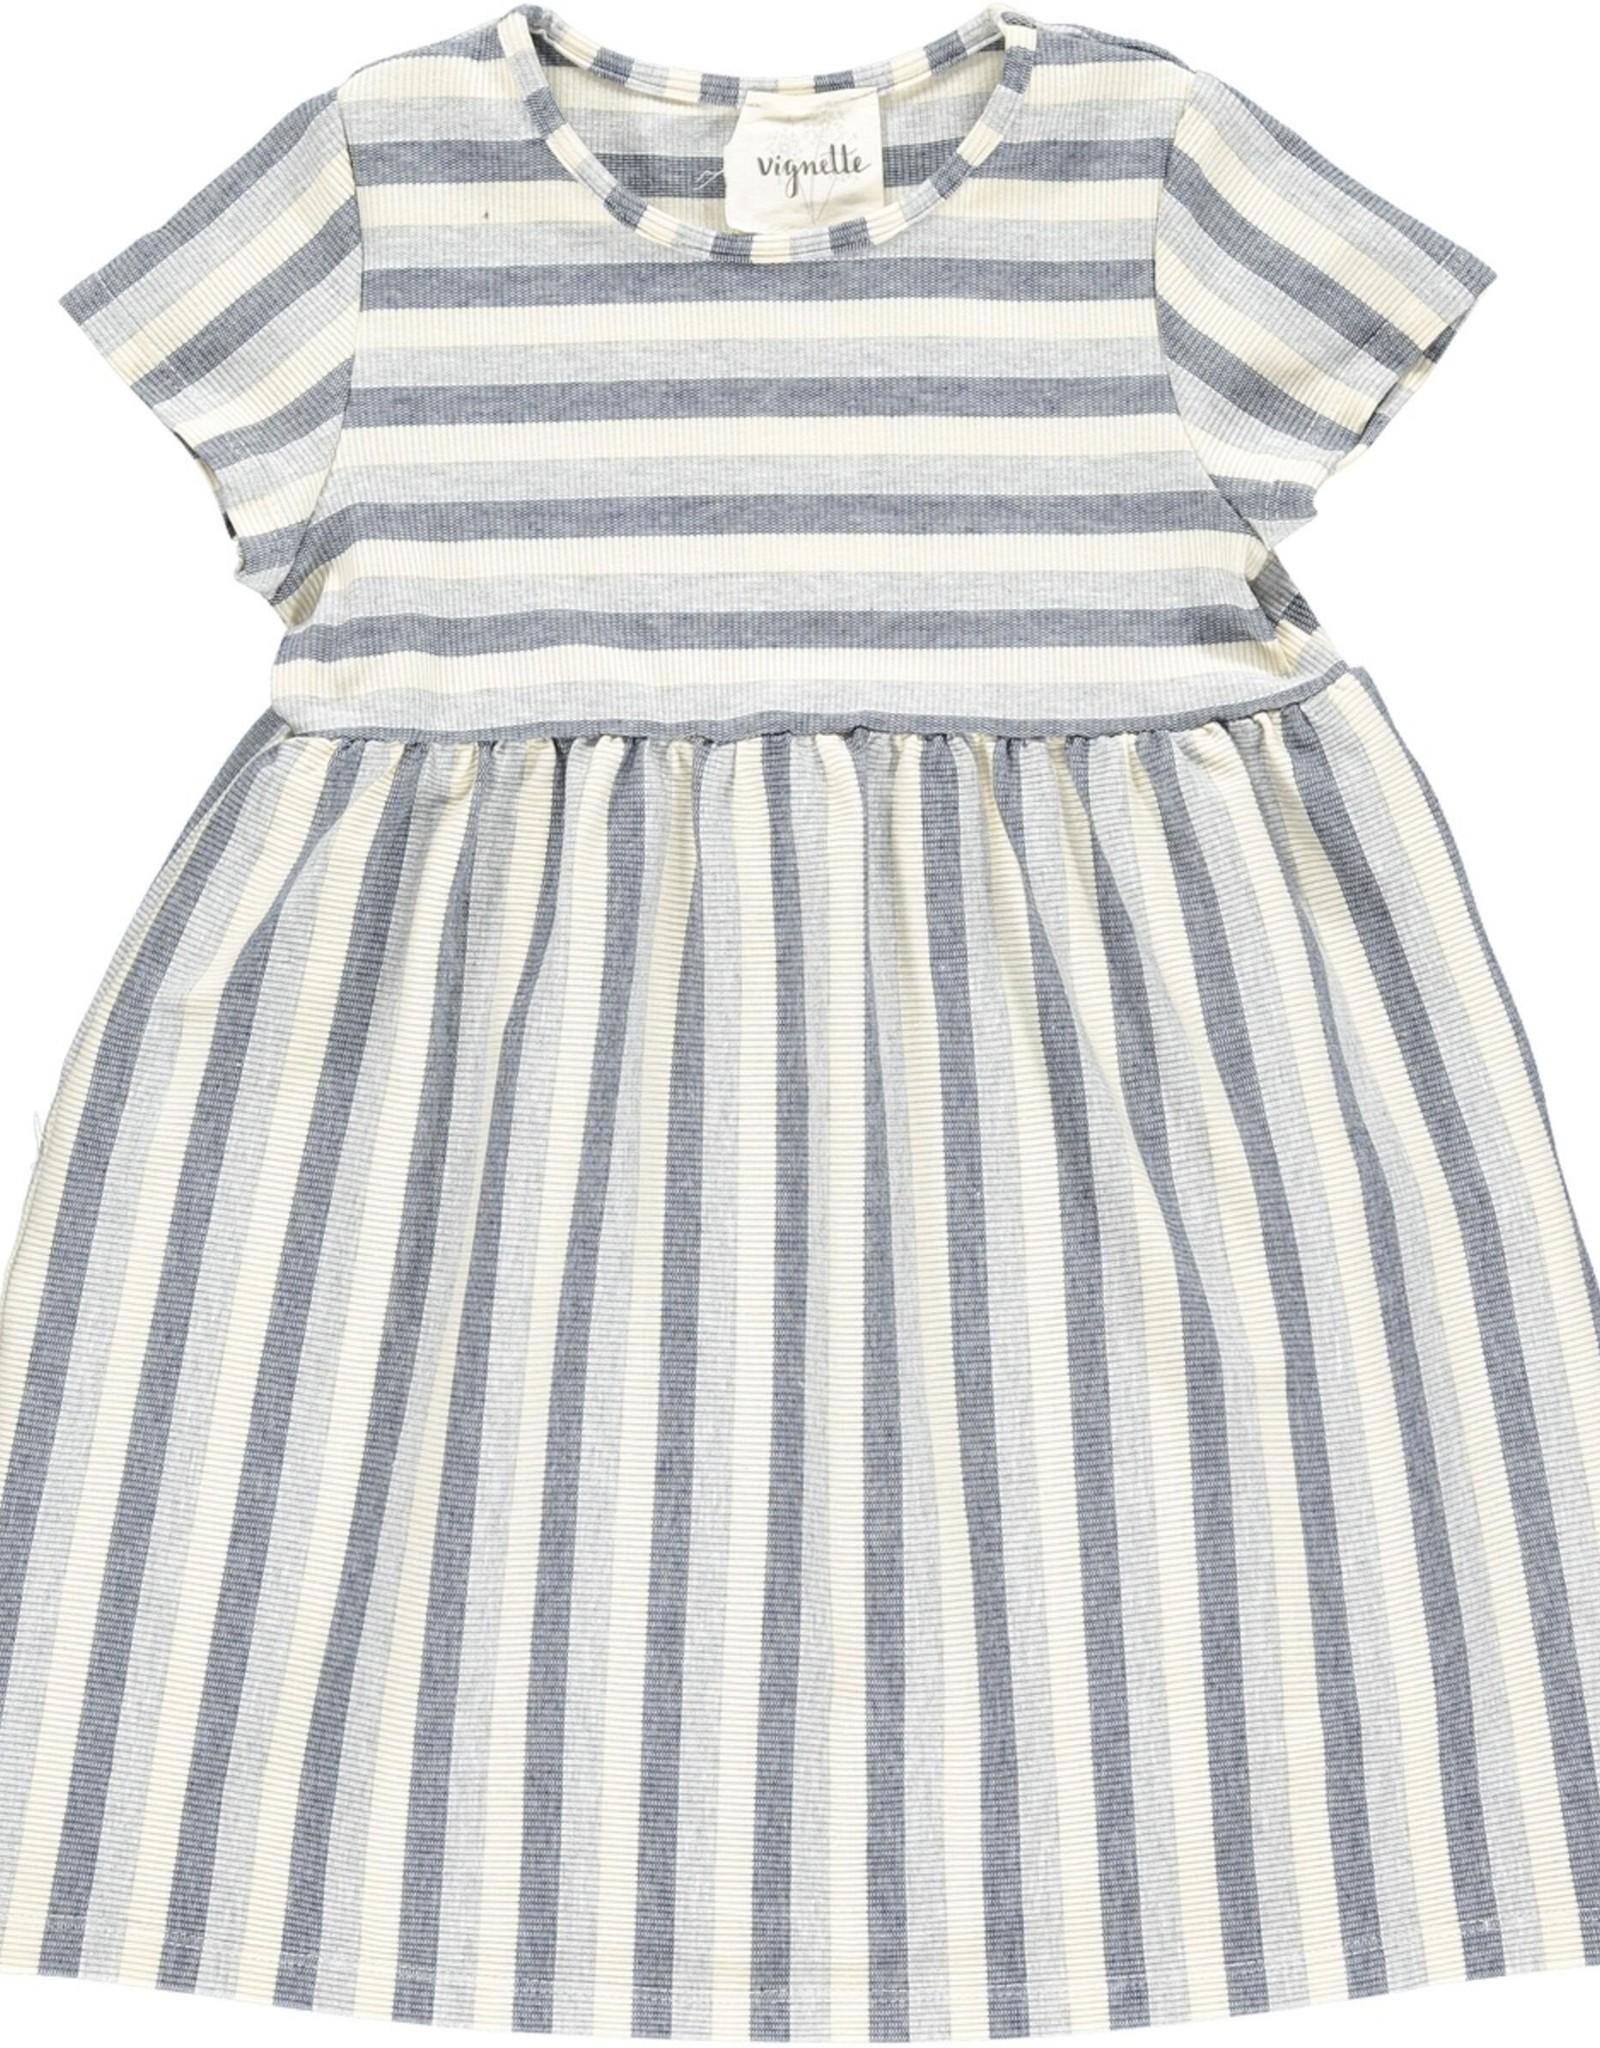 Vignette Claire Dress, Grey Stripe